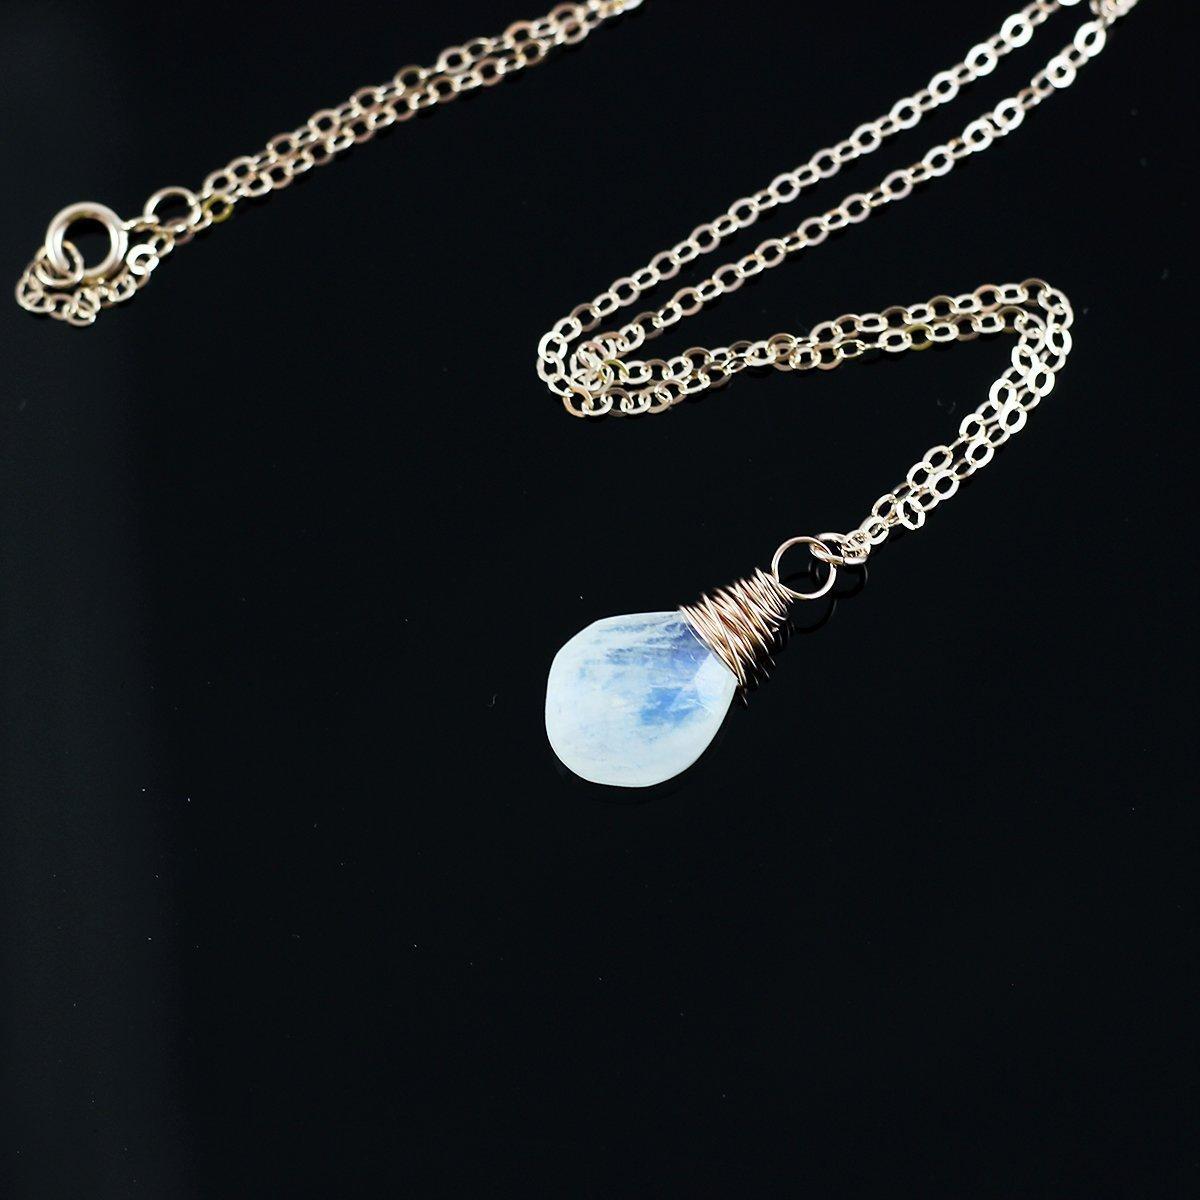 Rainbow Moonstone Rose Gold Pendant Necklace - 18 Length